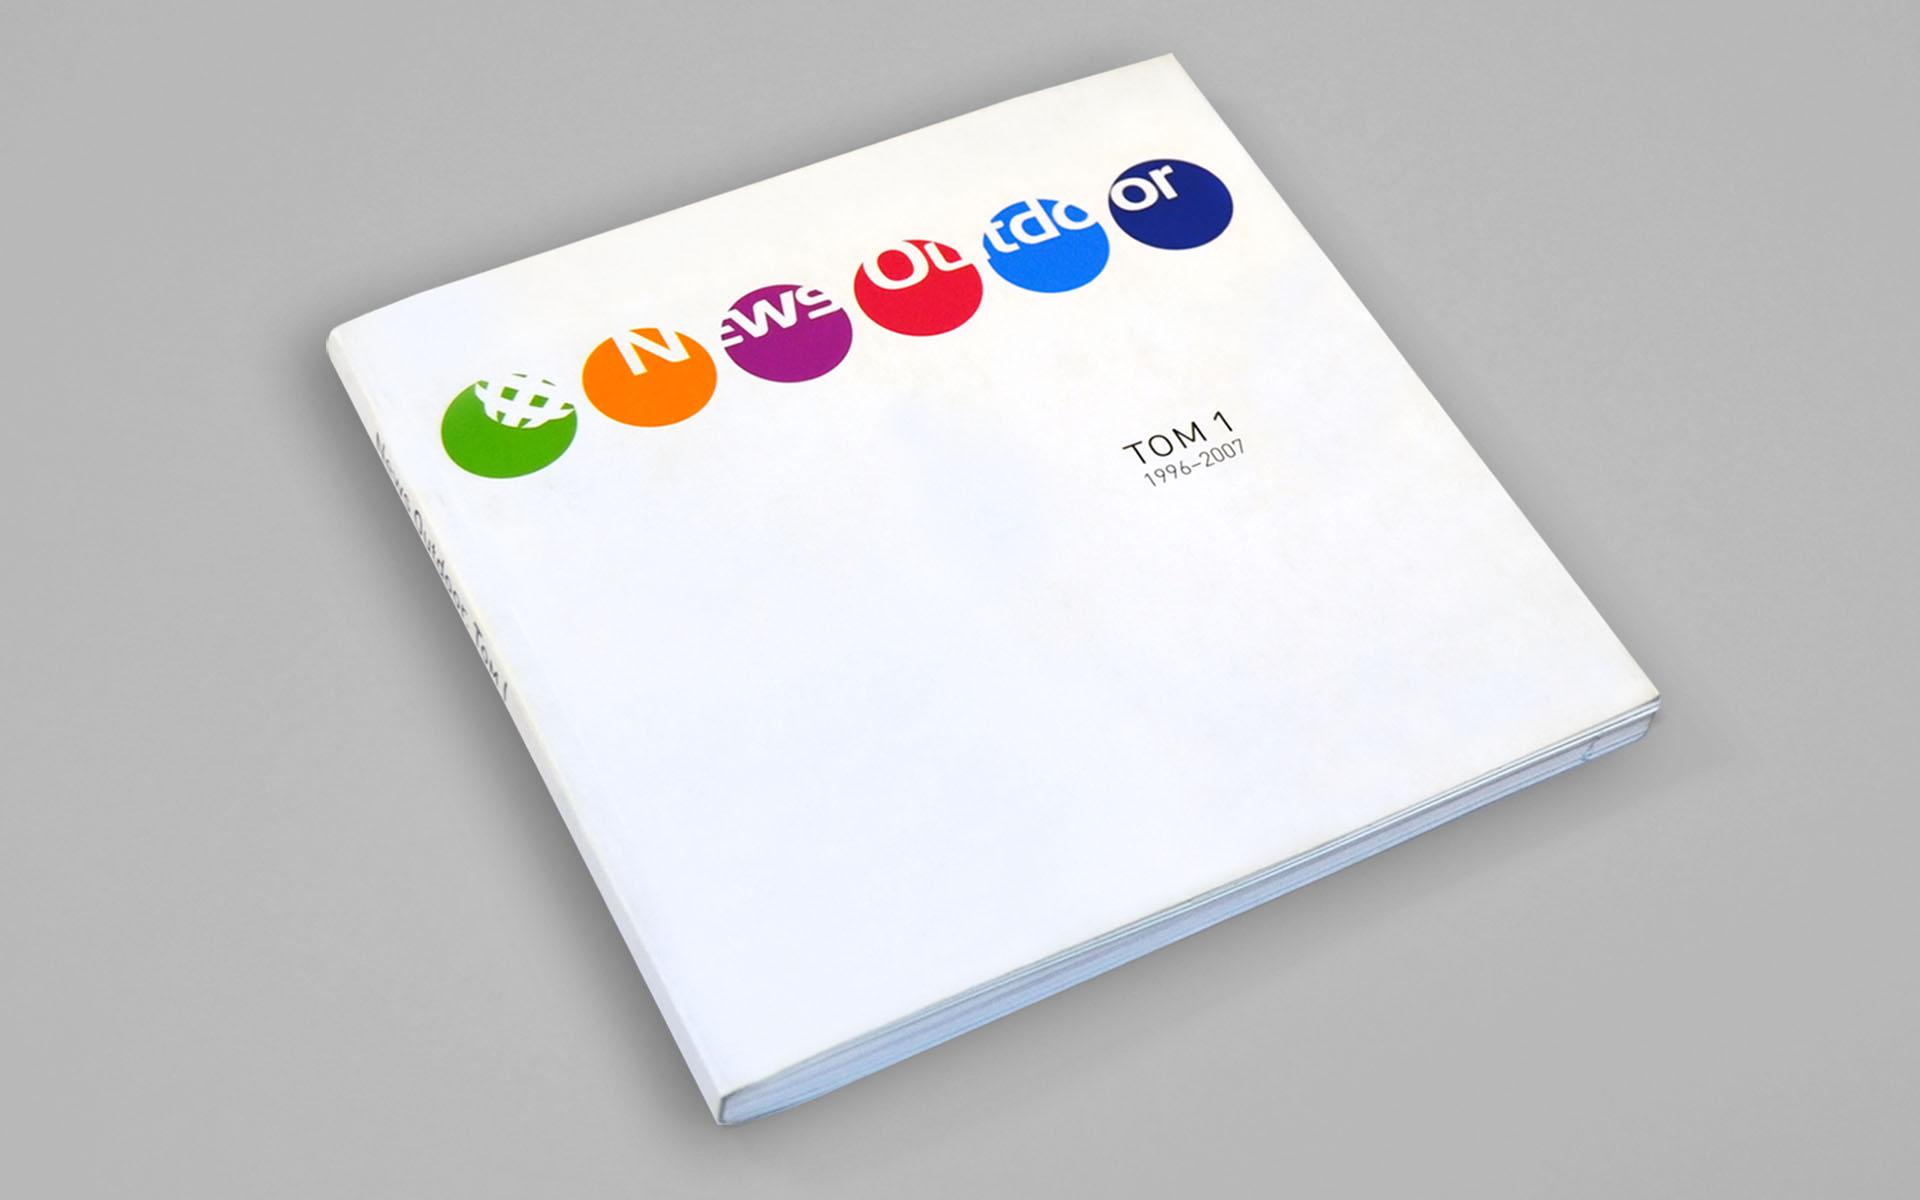 bookletNOG_1920x1200_1 копия